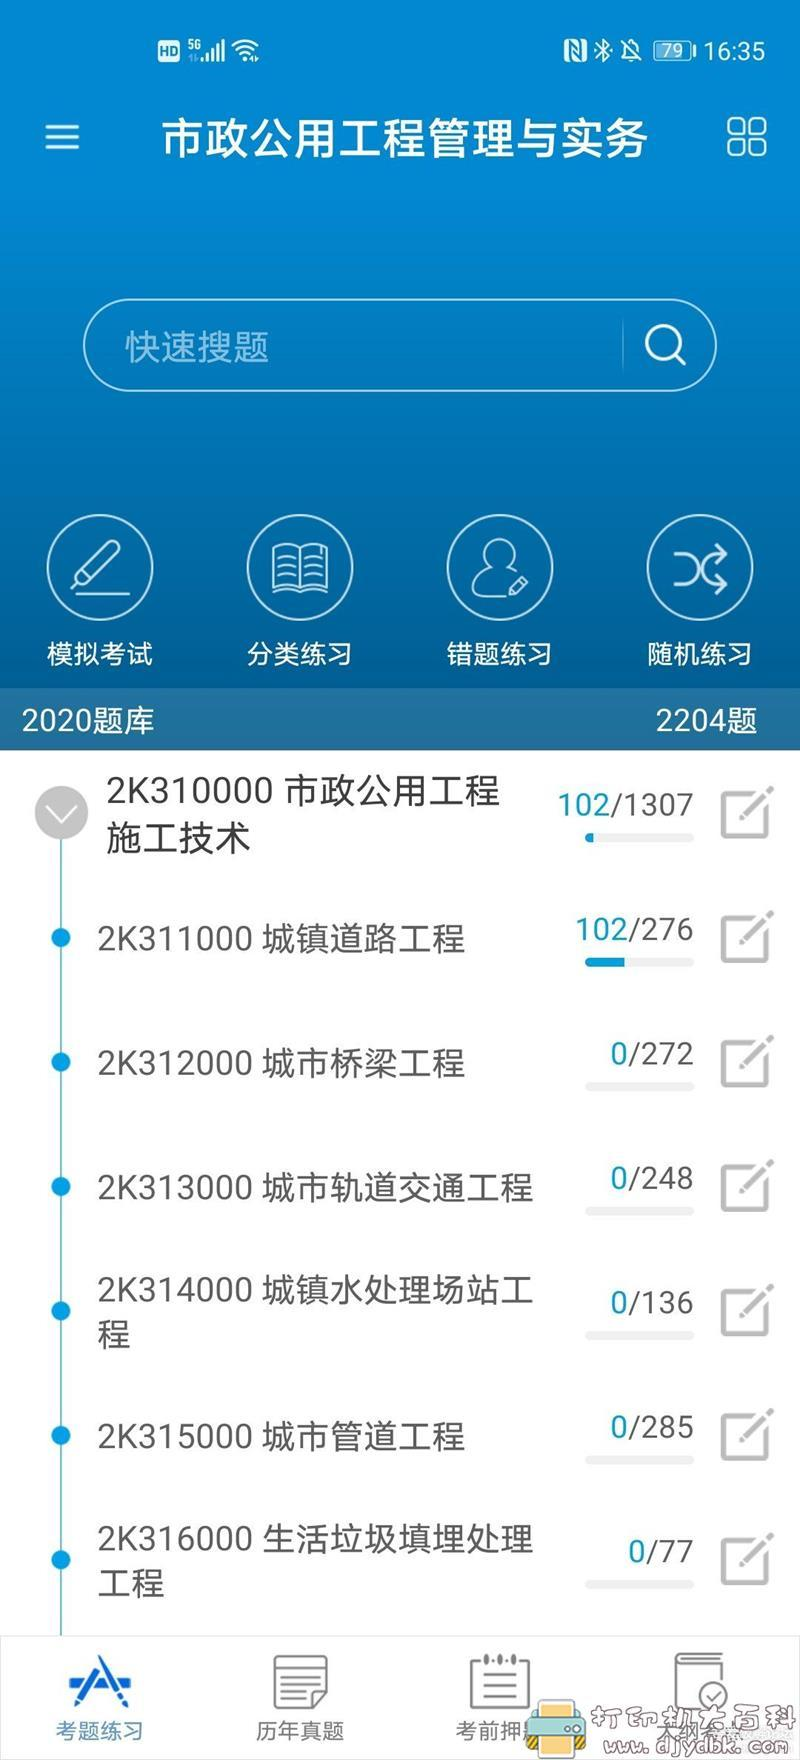 [Android]2021二级建造师刷题app 华云题库V9.0 配图 No.1